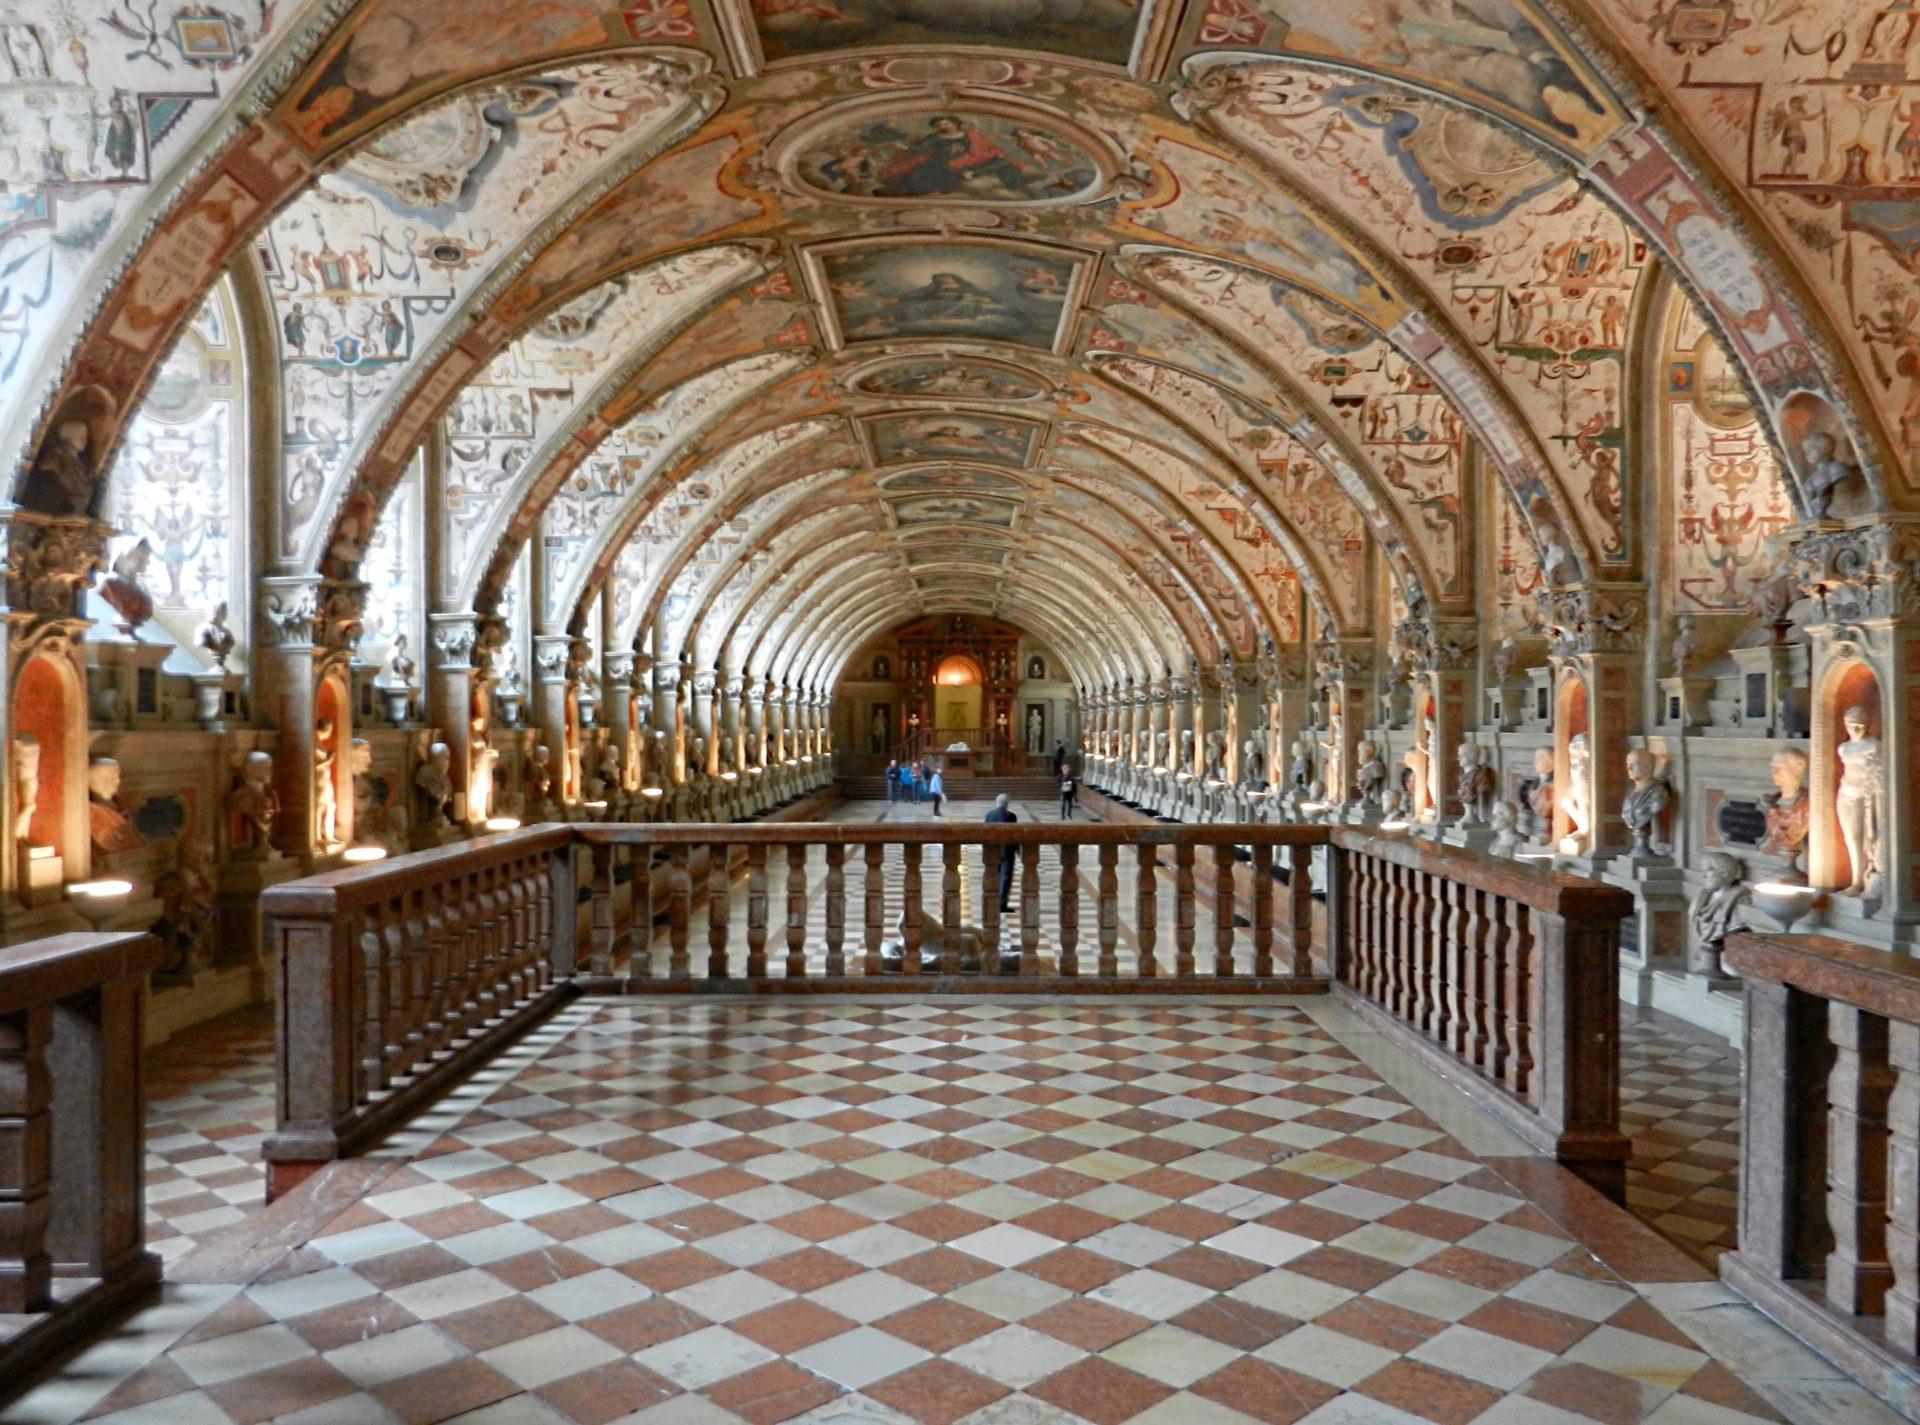 Antiquarium Munich Residenz Germany The Incredibly Long